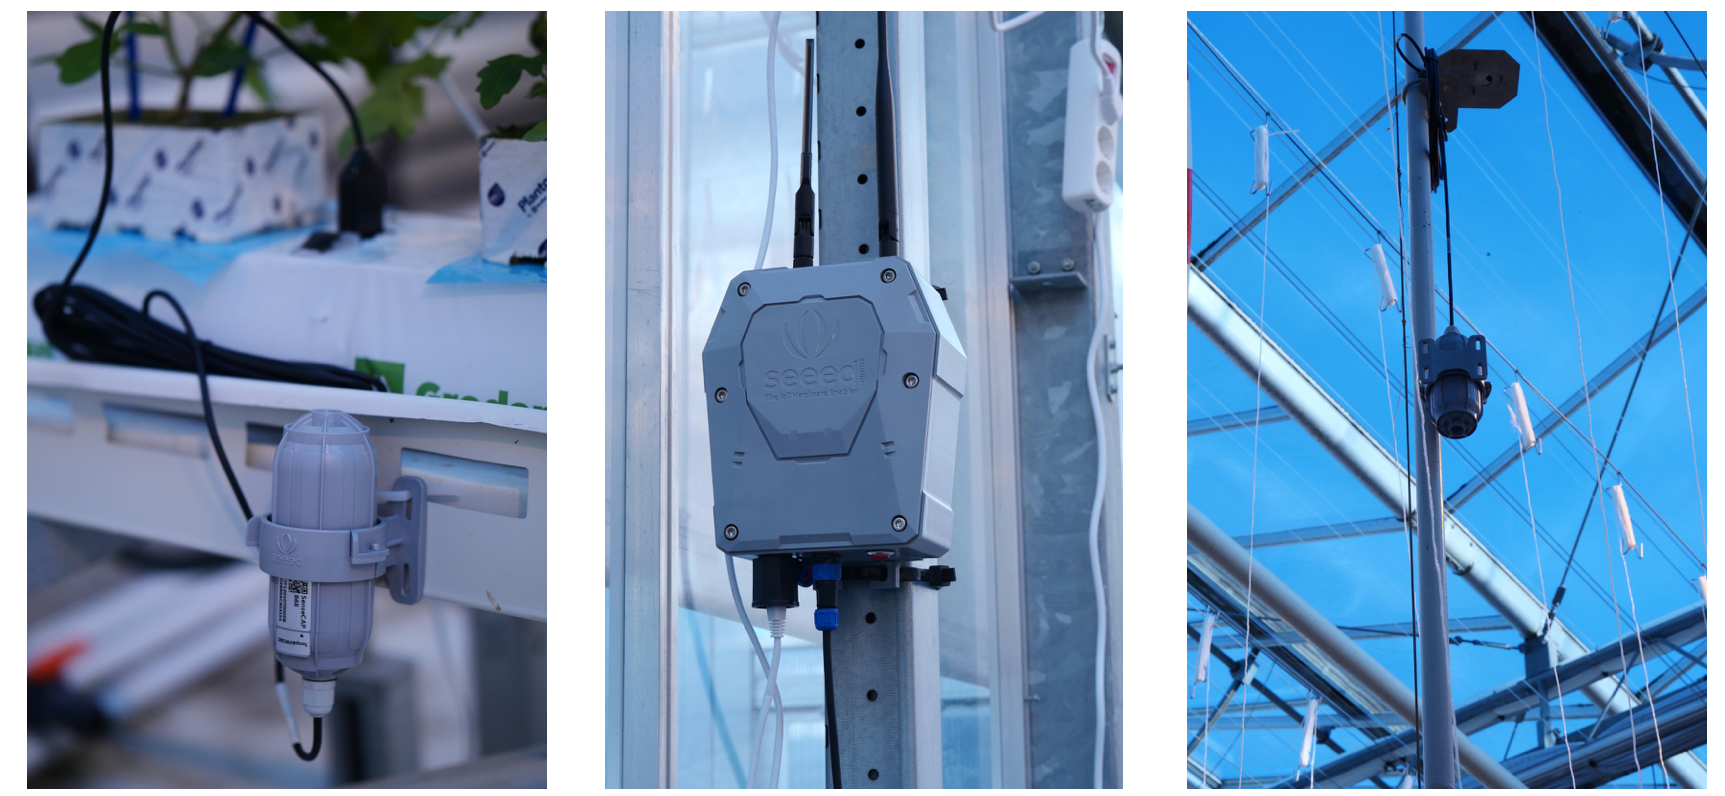 SenseCAP LoRaWAN Gateway & Sensors deployed in the Autonomous Greenhouse Challenge